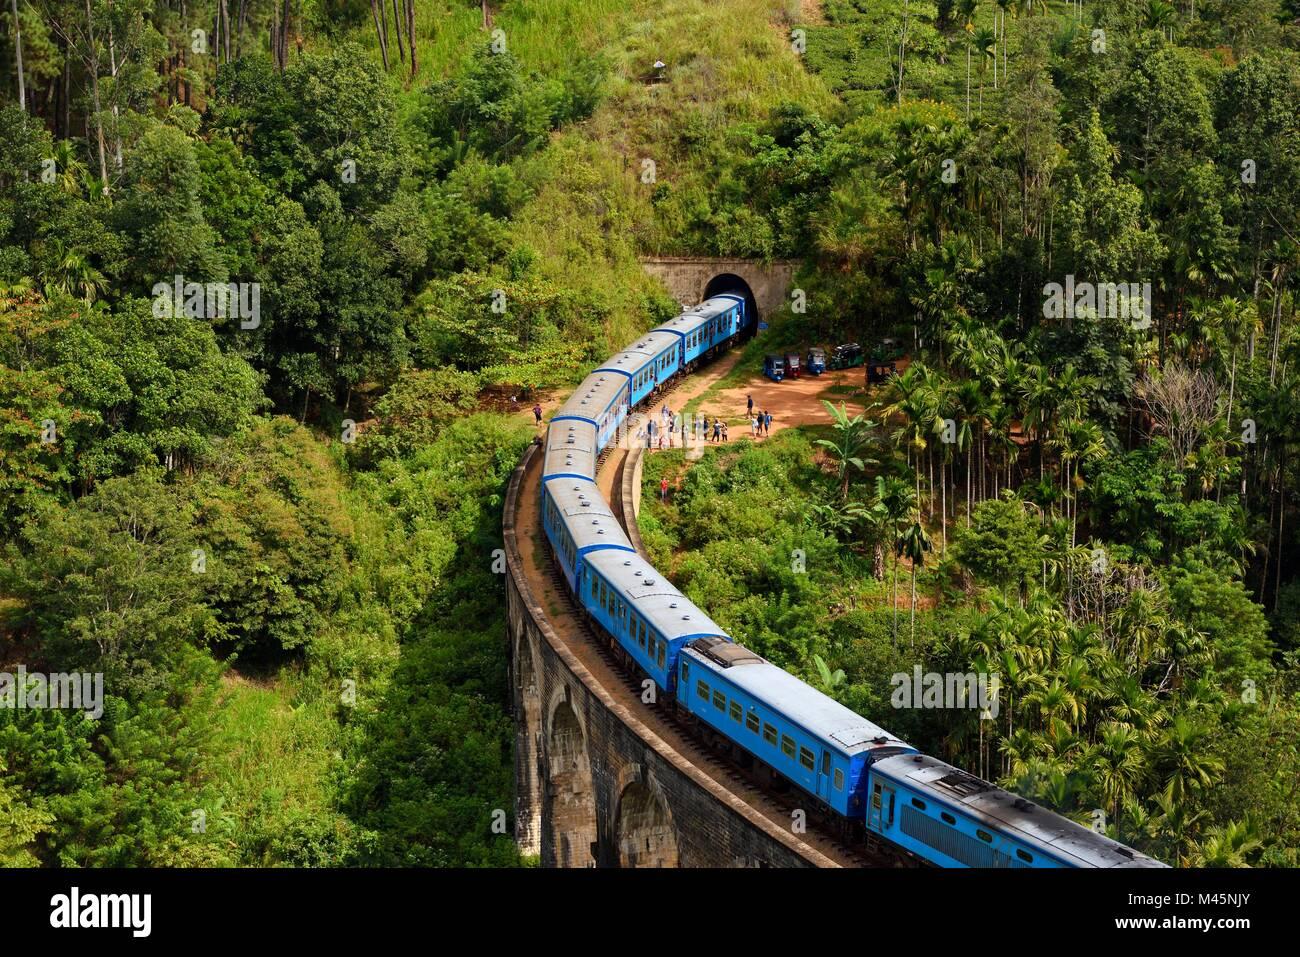 Train on the Nine Arches Bridge in the highlands near Ella,Sri Lanka - Stock Image